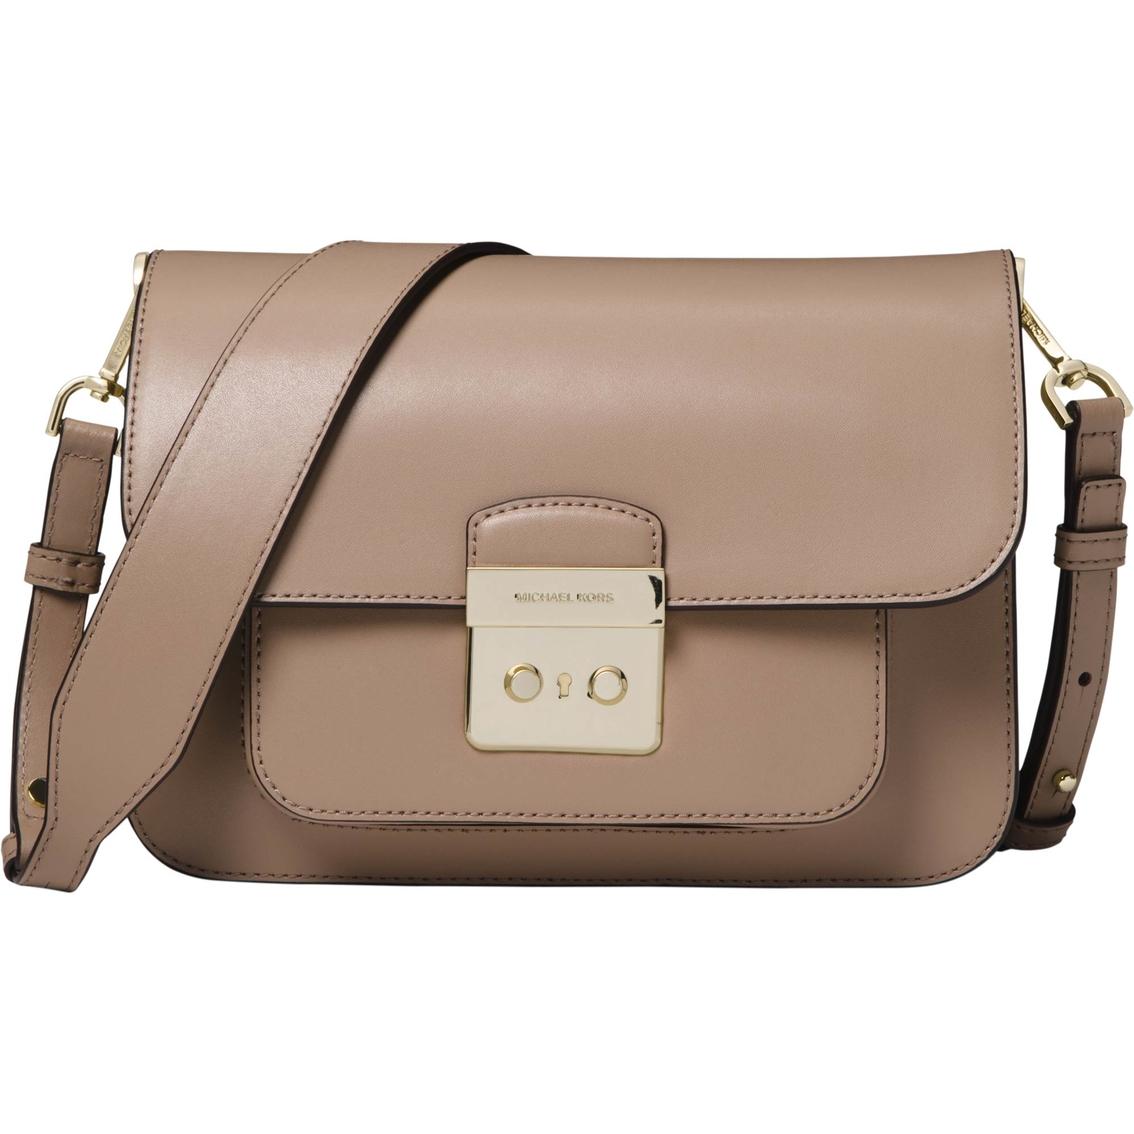 9cd47299b694 Michael Kors Sloan Editor Leather Large Shoulder Bag | Handbags ...